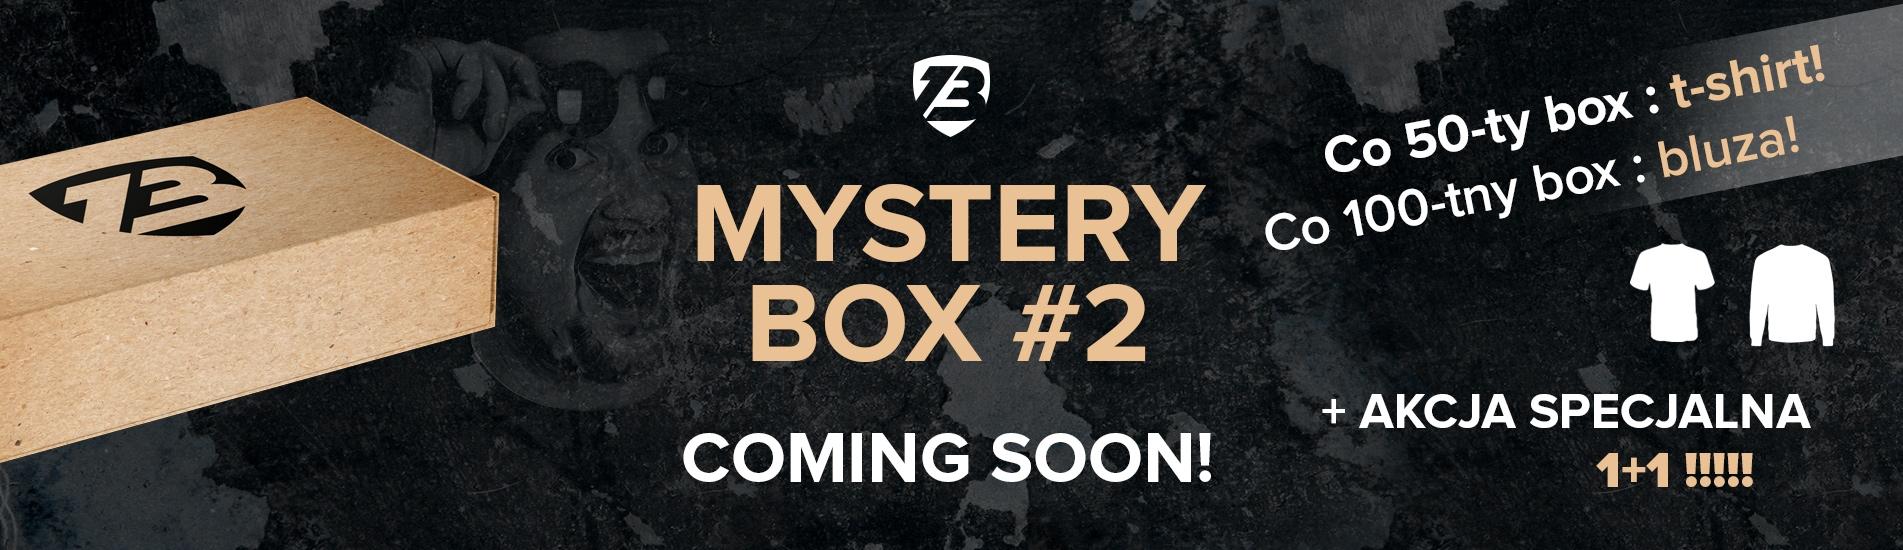 MYSTERYBOX #2